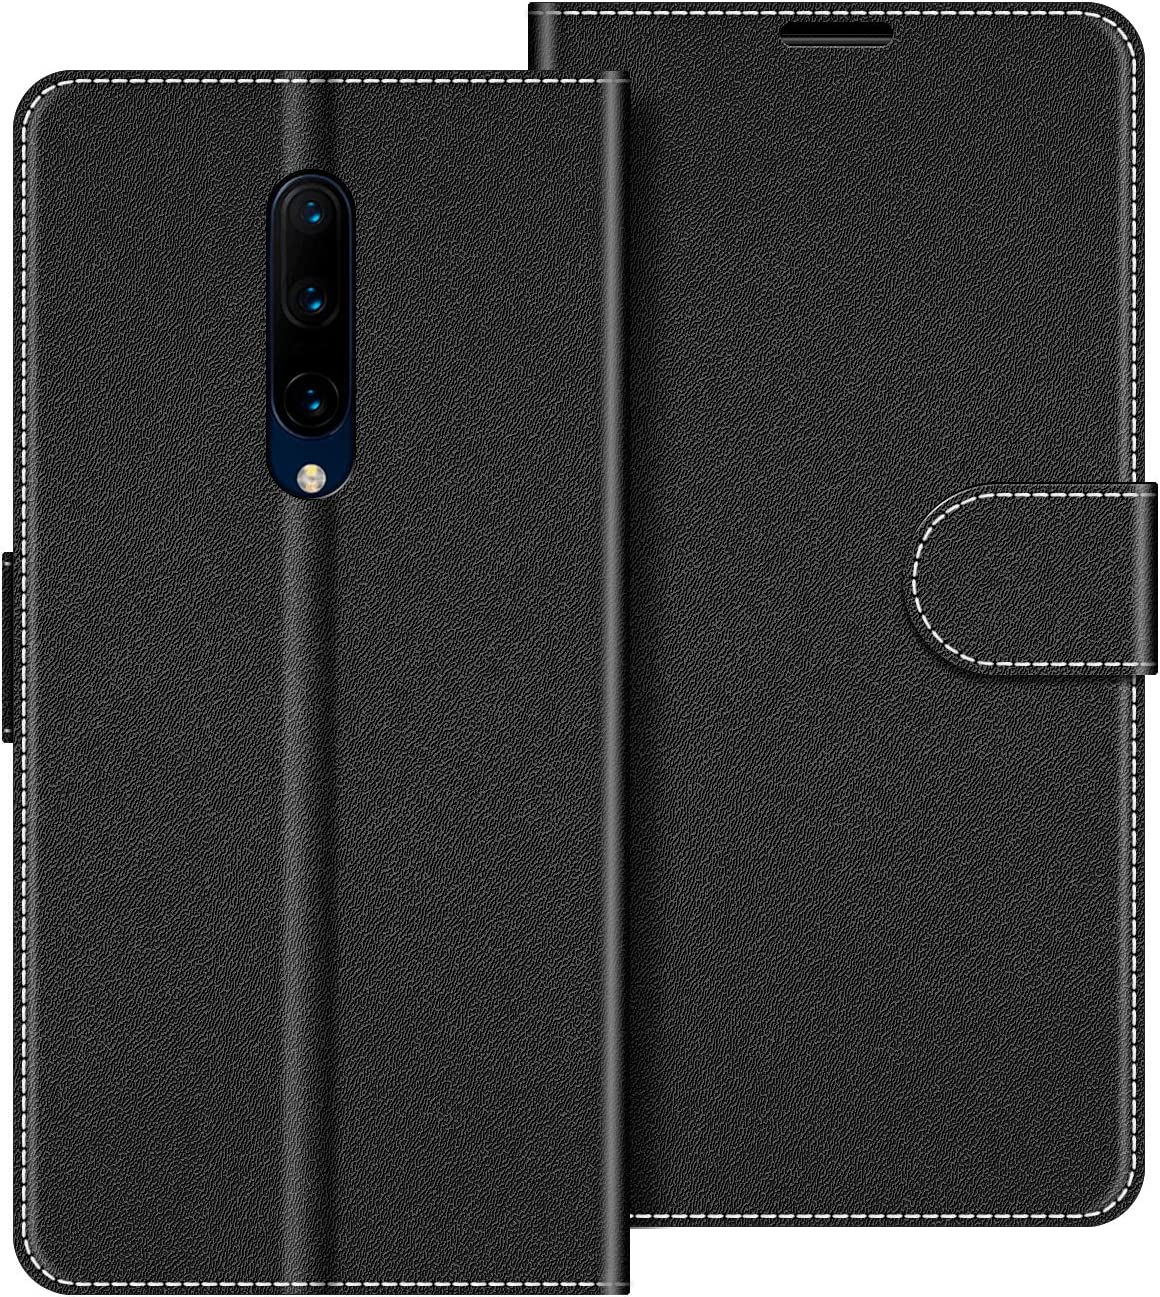 COODIO Funda OnePlus 7 Pro con Tapa, Funda Movil OnePlus 7 Pro, Funda Libro OnePlus 7 Pro Carcasa Magnético Funda para OnePlus 7 Pro, Negro: Amazon.es: Electrónica